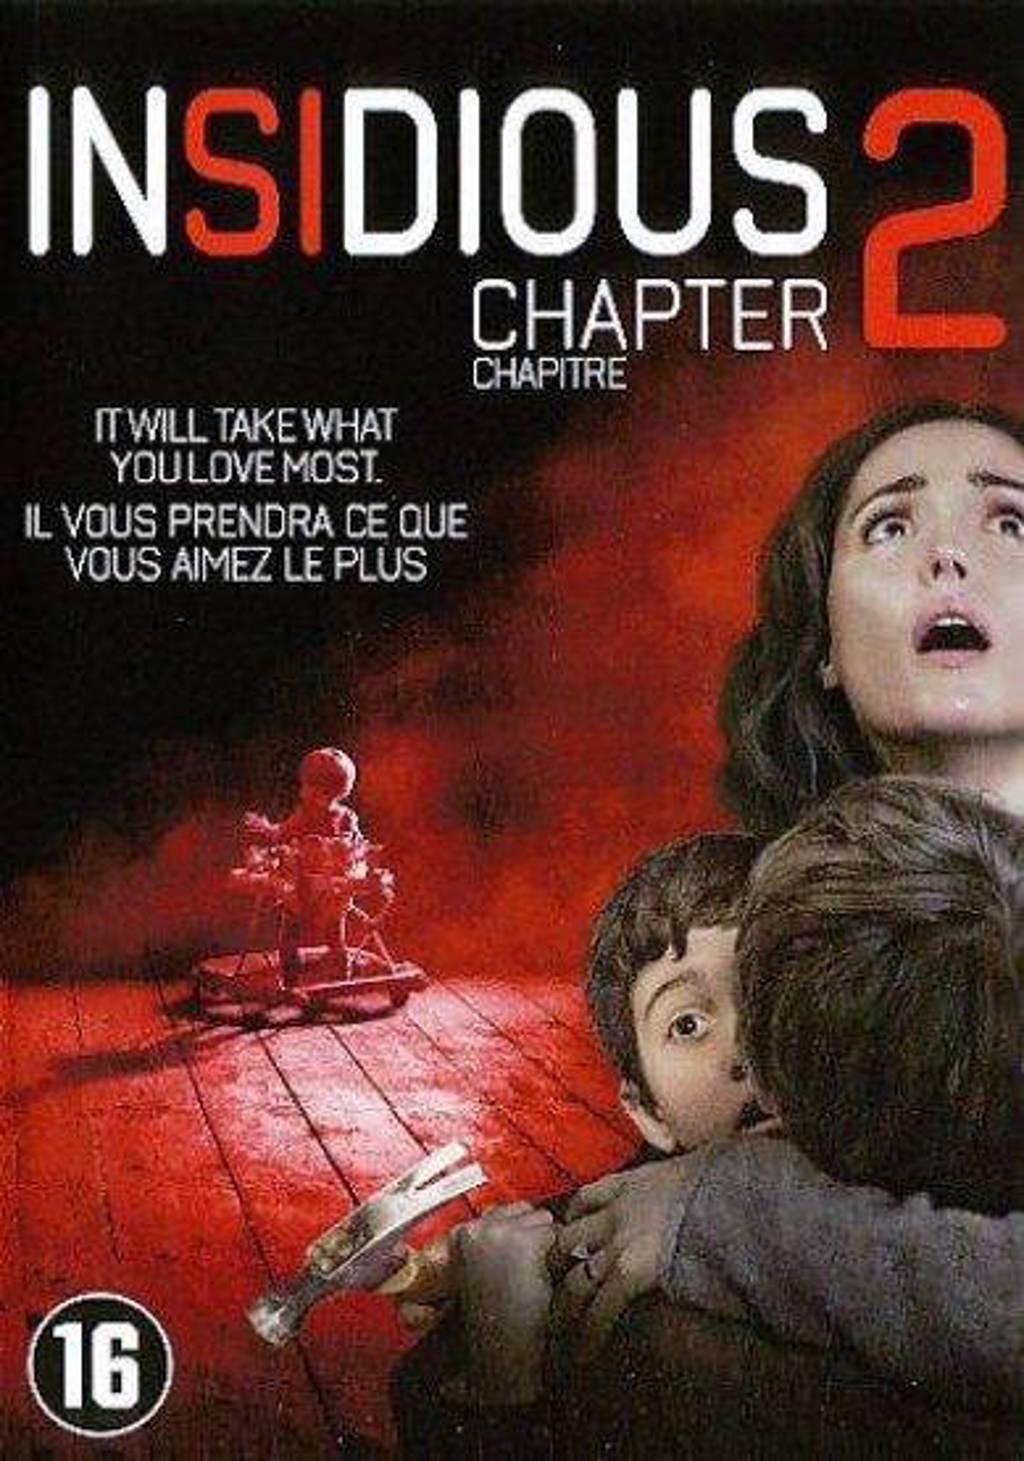 Insidious - Chapter 2 (DVD)